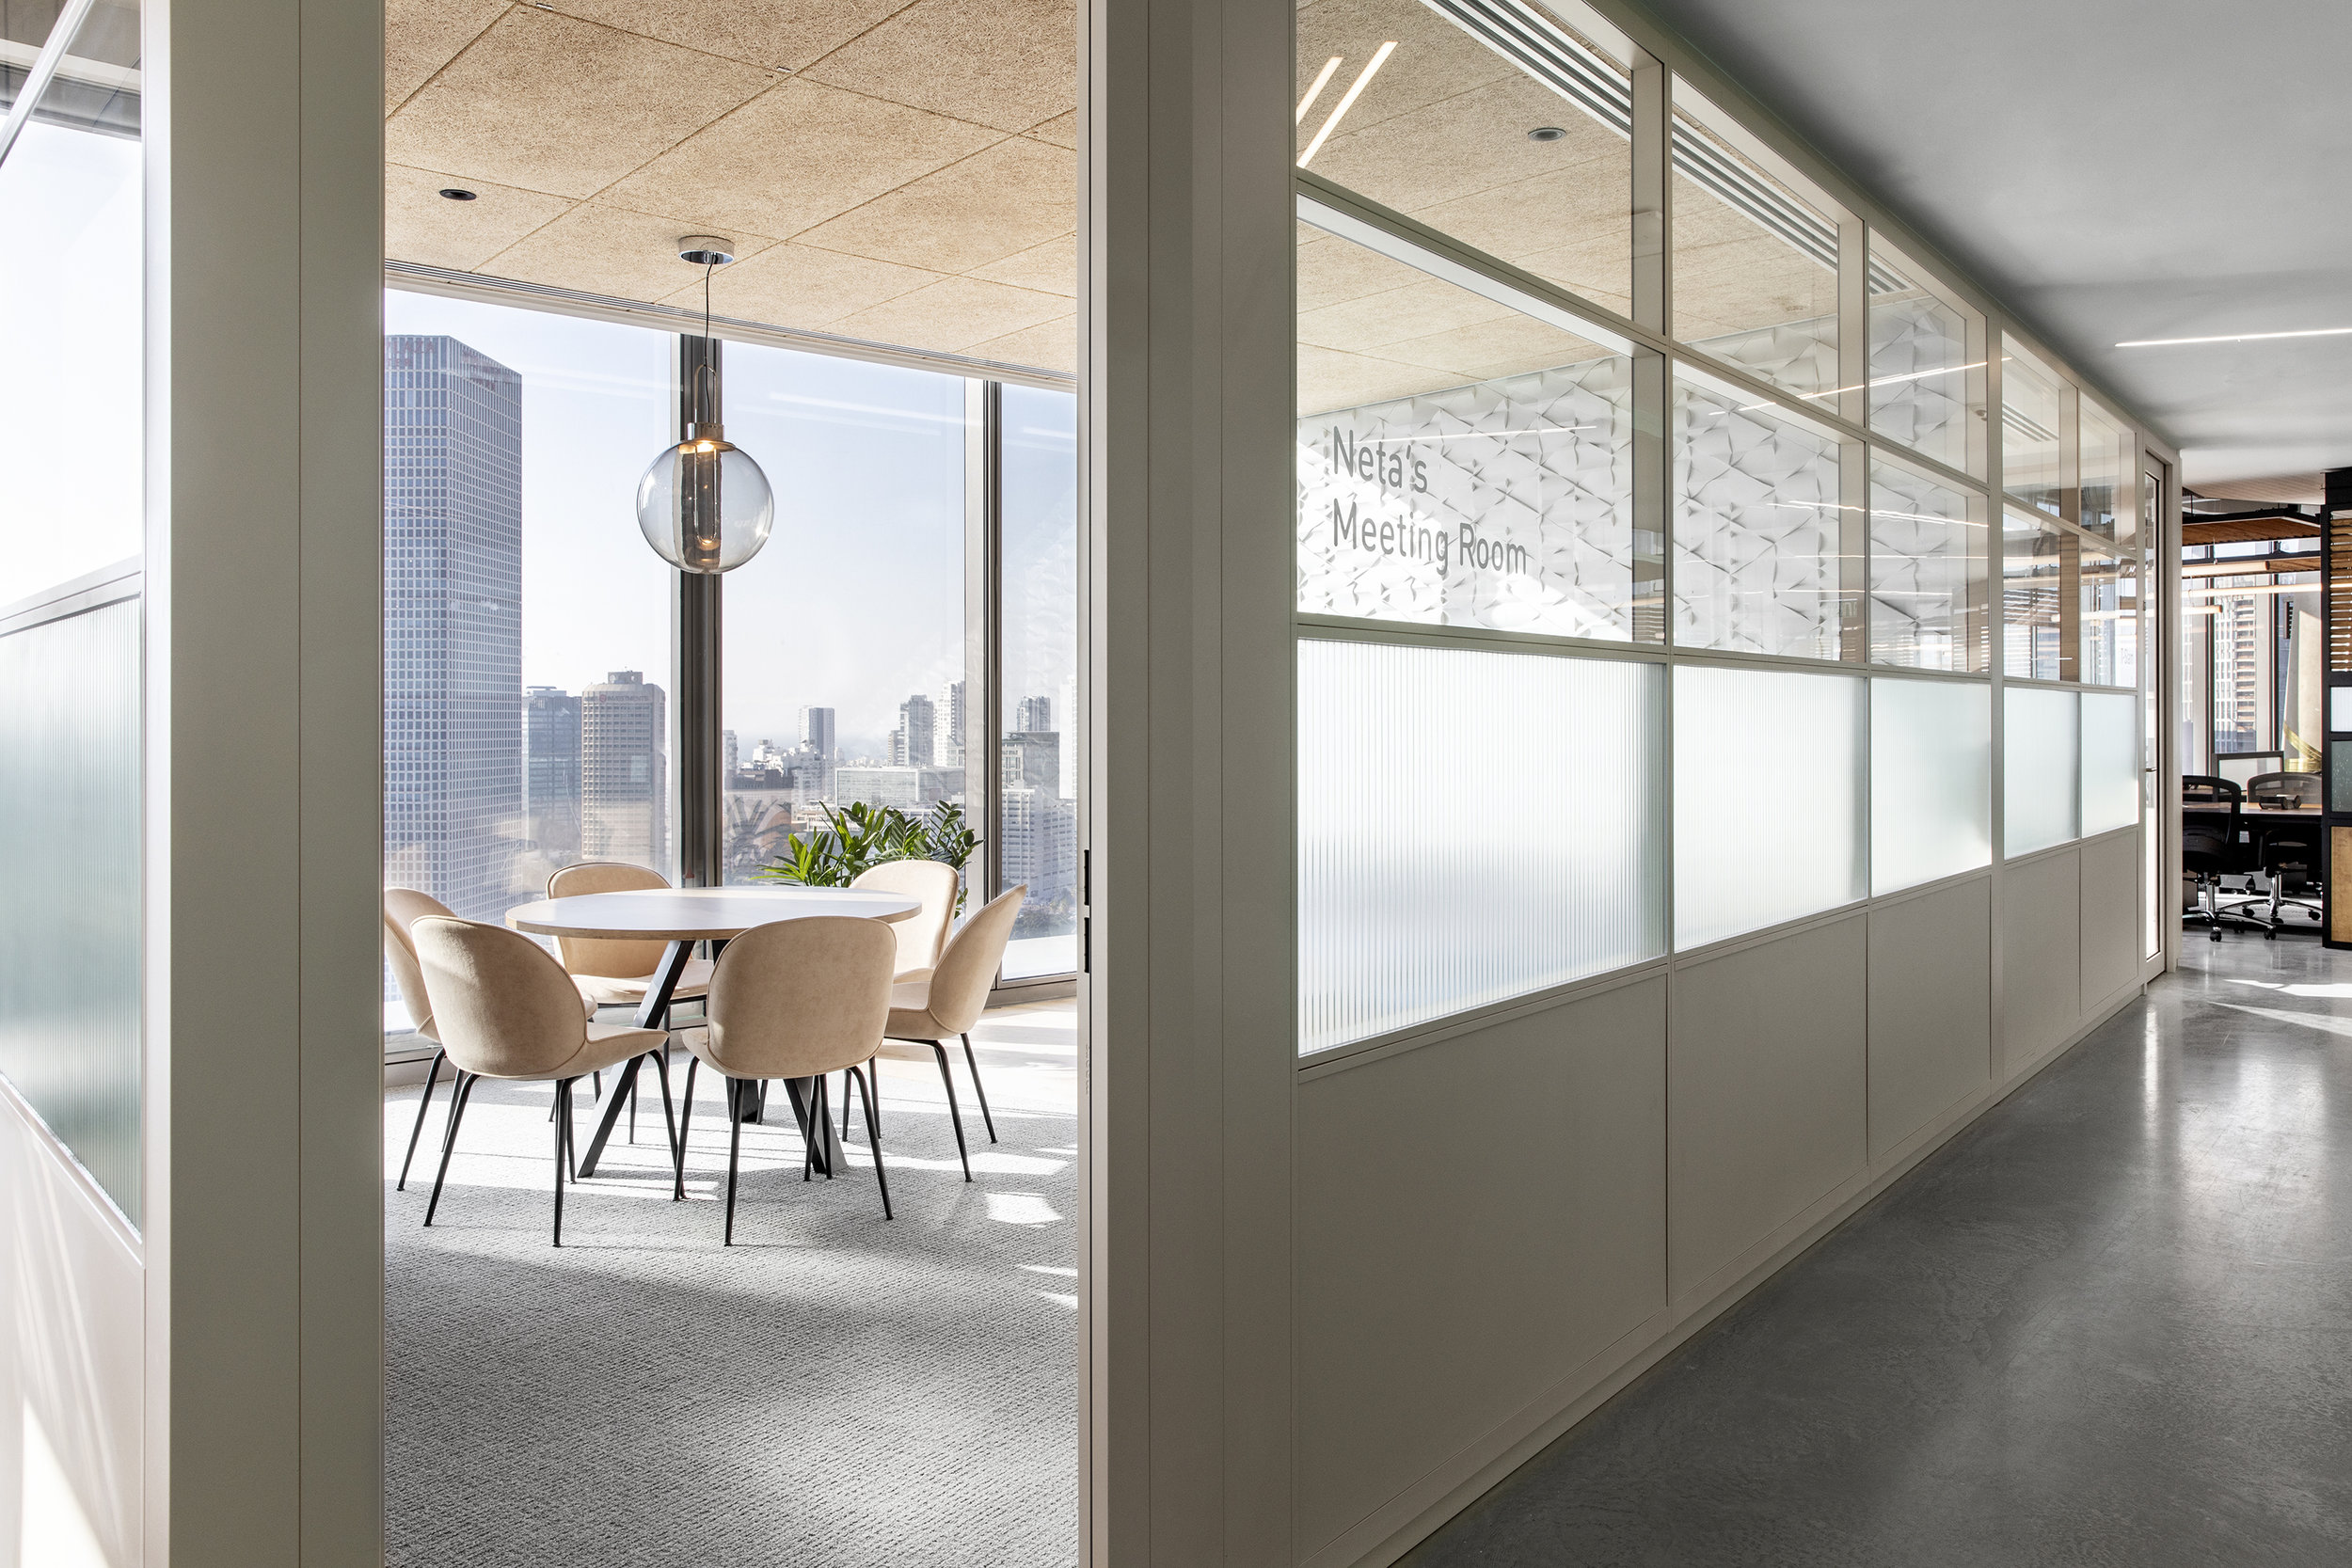 רואי דוד אדריכלות - אדריכל - נטורל אינטליג'נס - ROY DAVID - ARCHITECTURE - ARCHITECT - NI (99).jpg